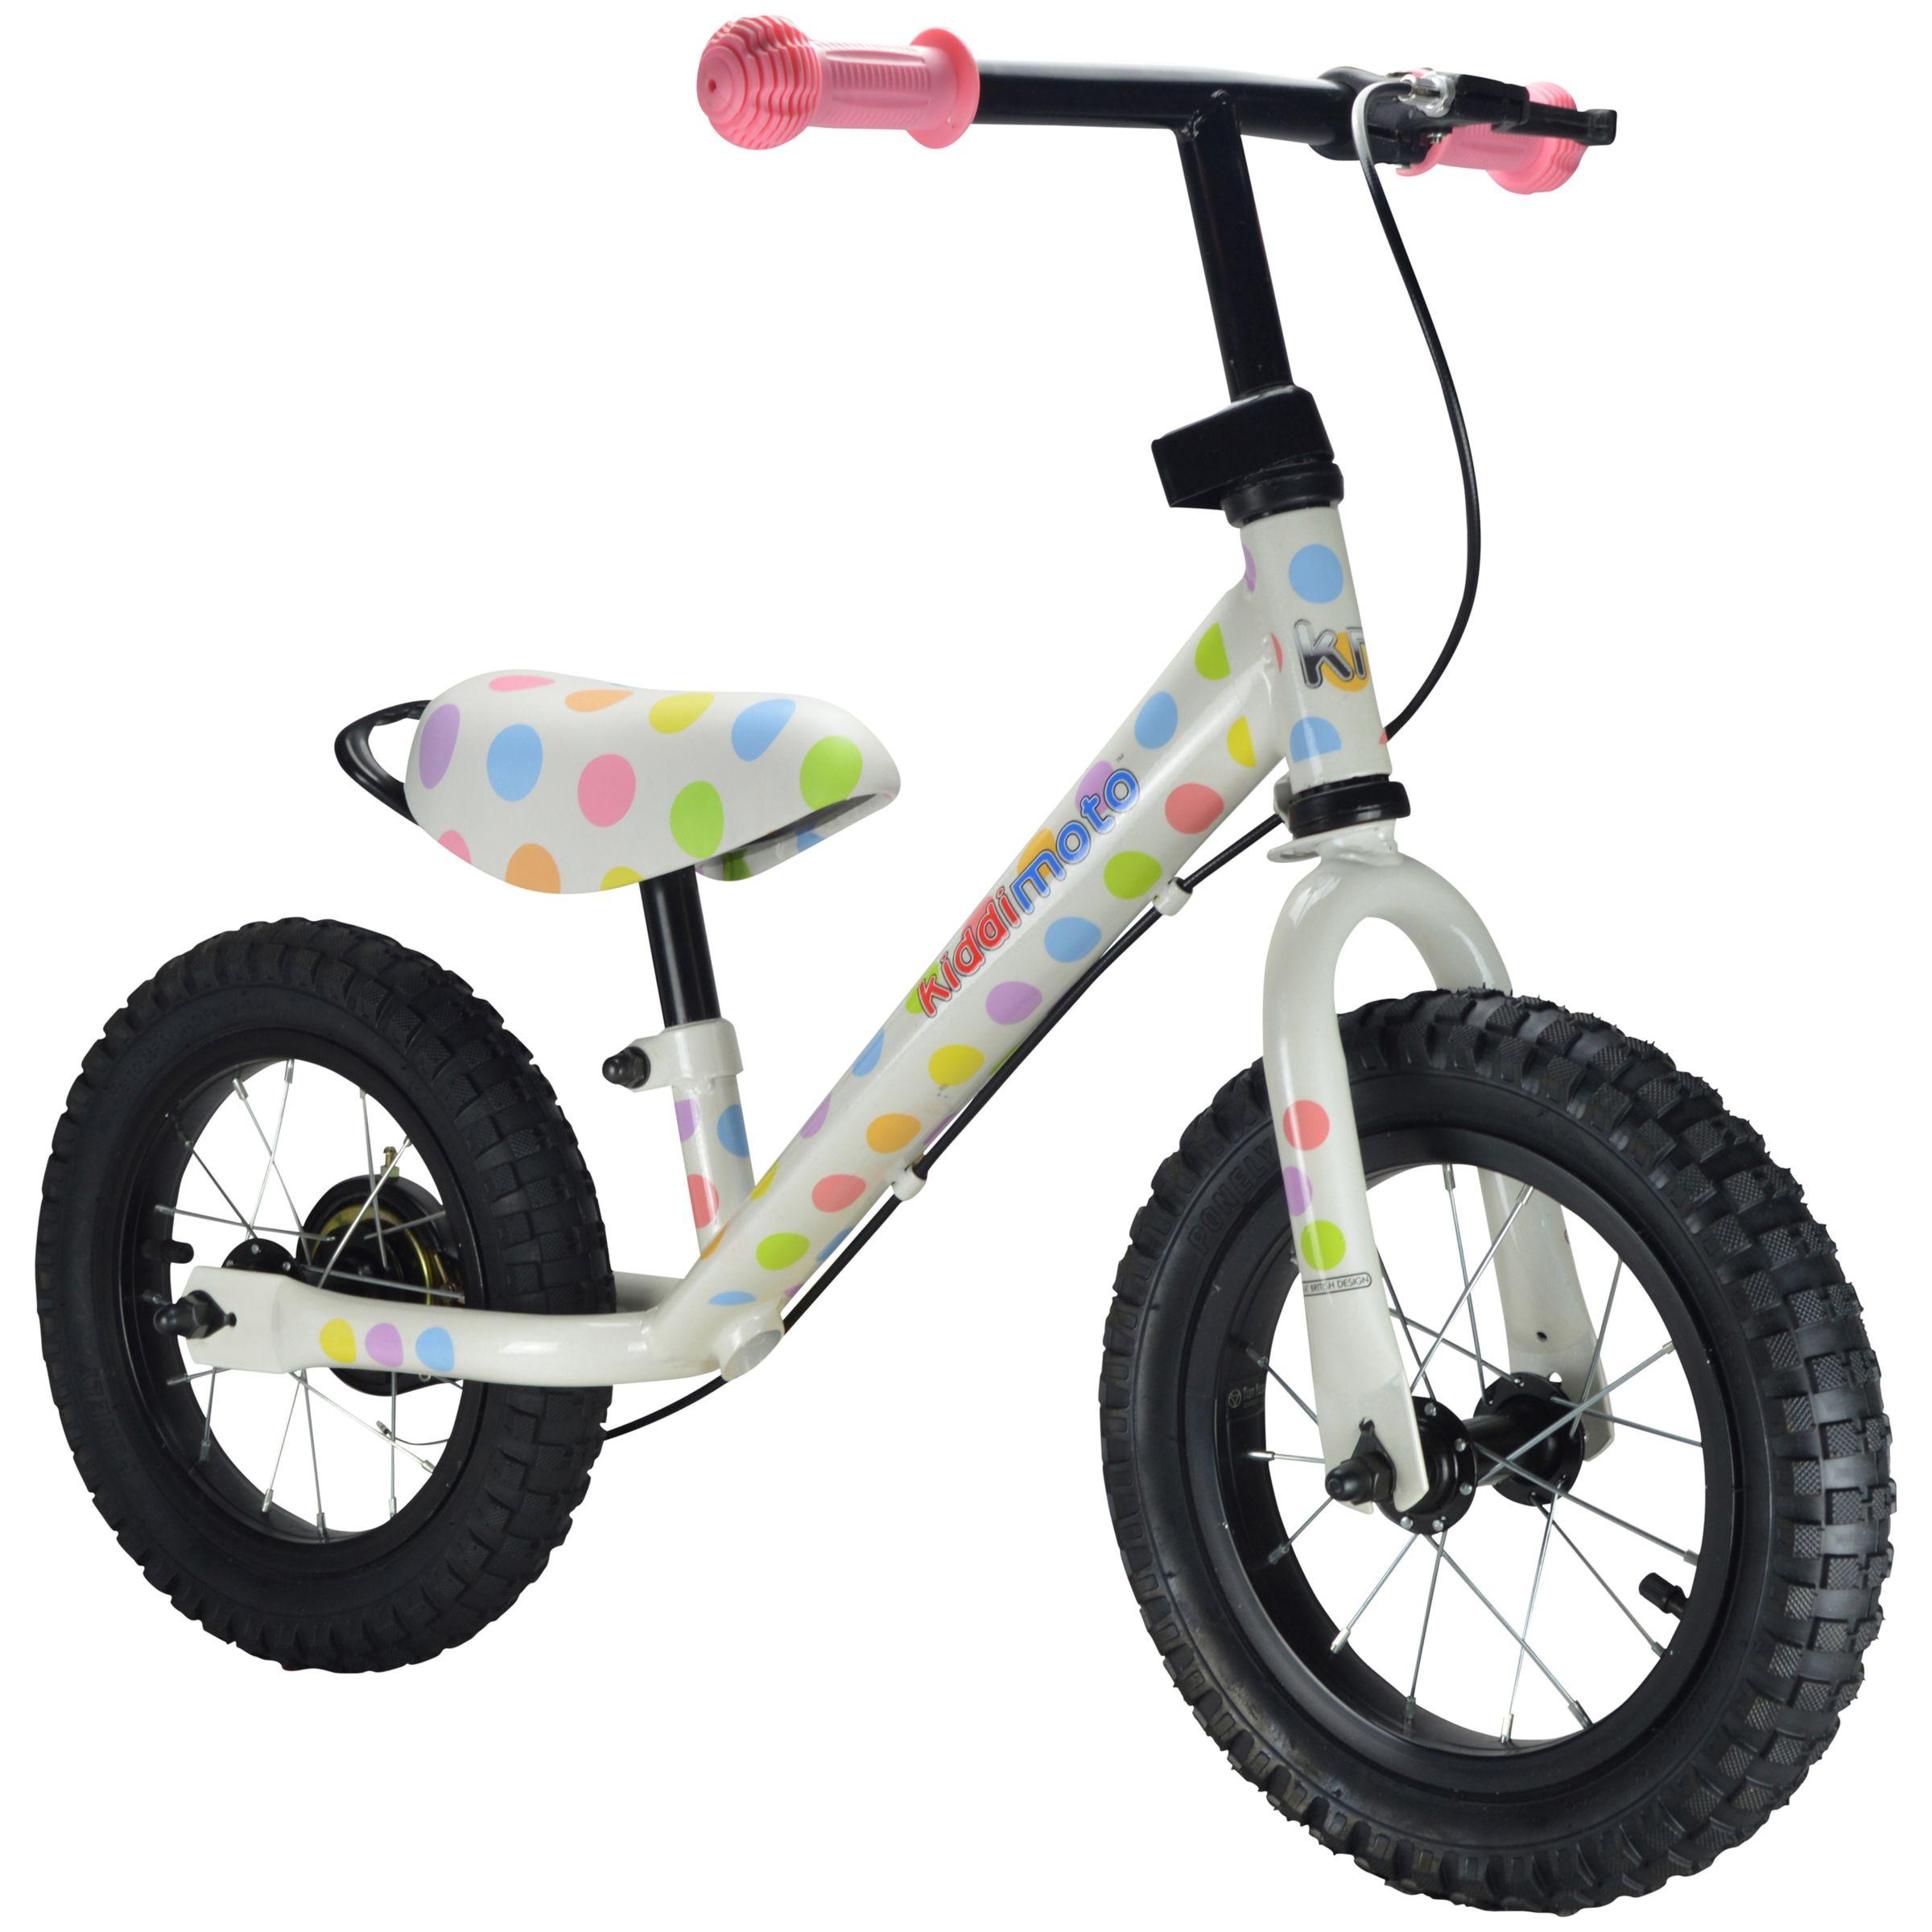 Kiddimoto Kiddimoto Super Junior Max Pastel Dot Balance Bike